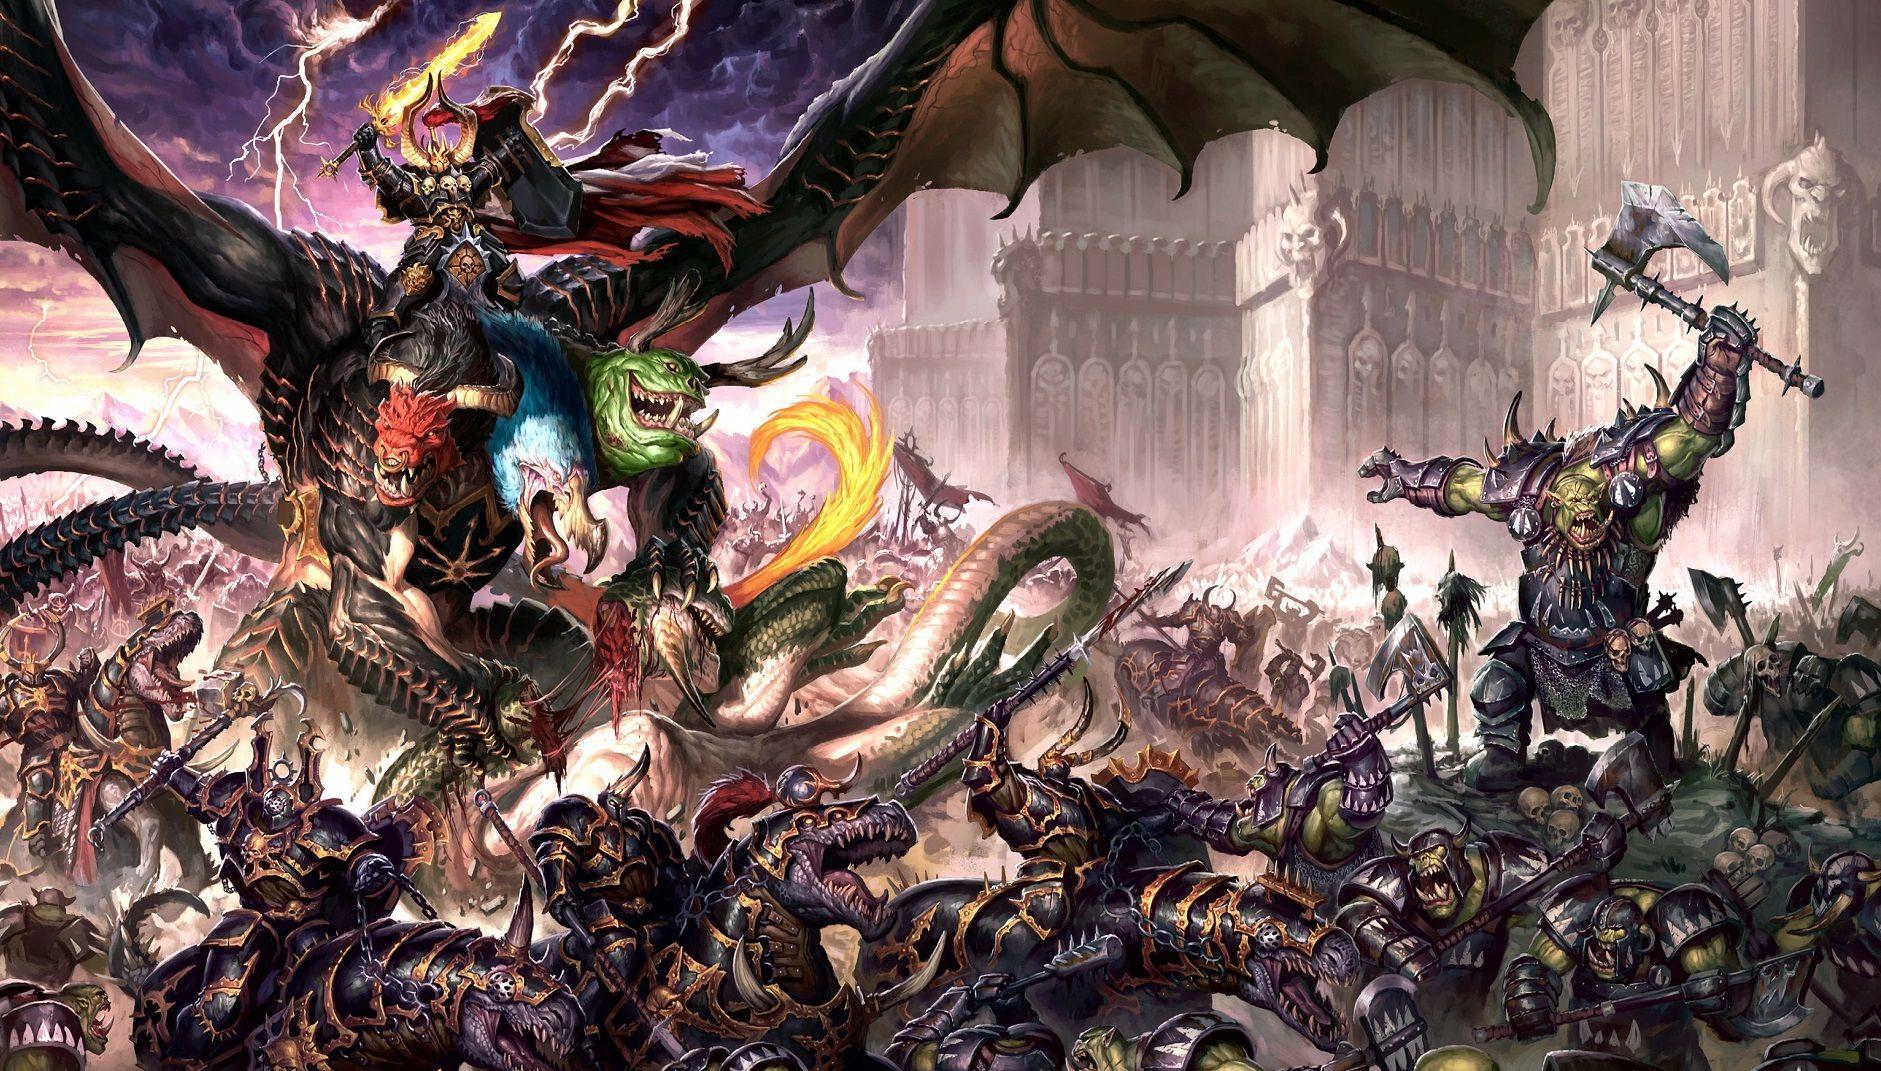 Forces Of Chaos vs Orruks